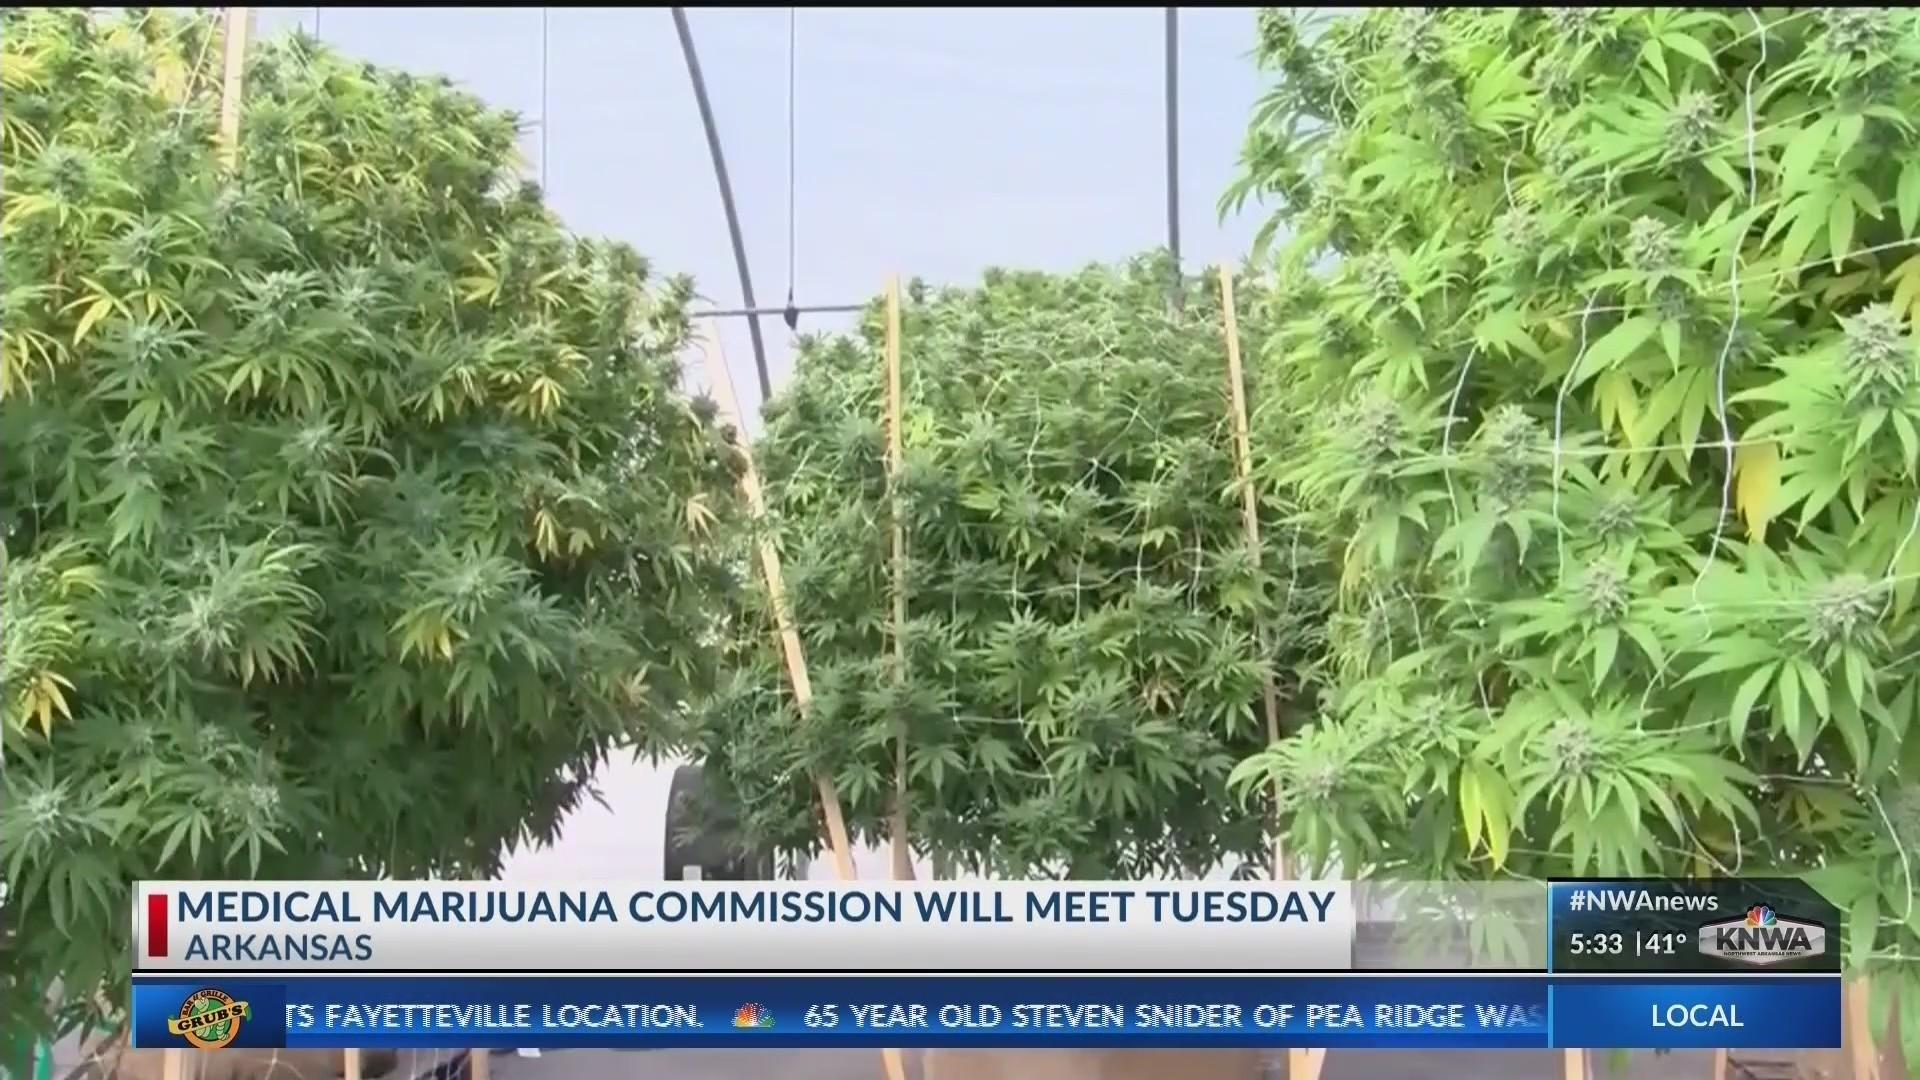 Arkansas___s_Medical_Marijuana_Commissio_0_20181016121705